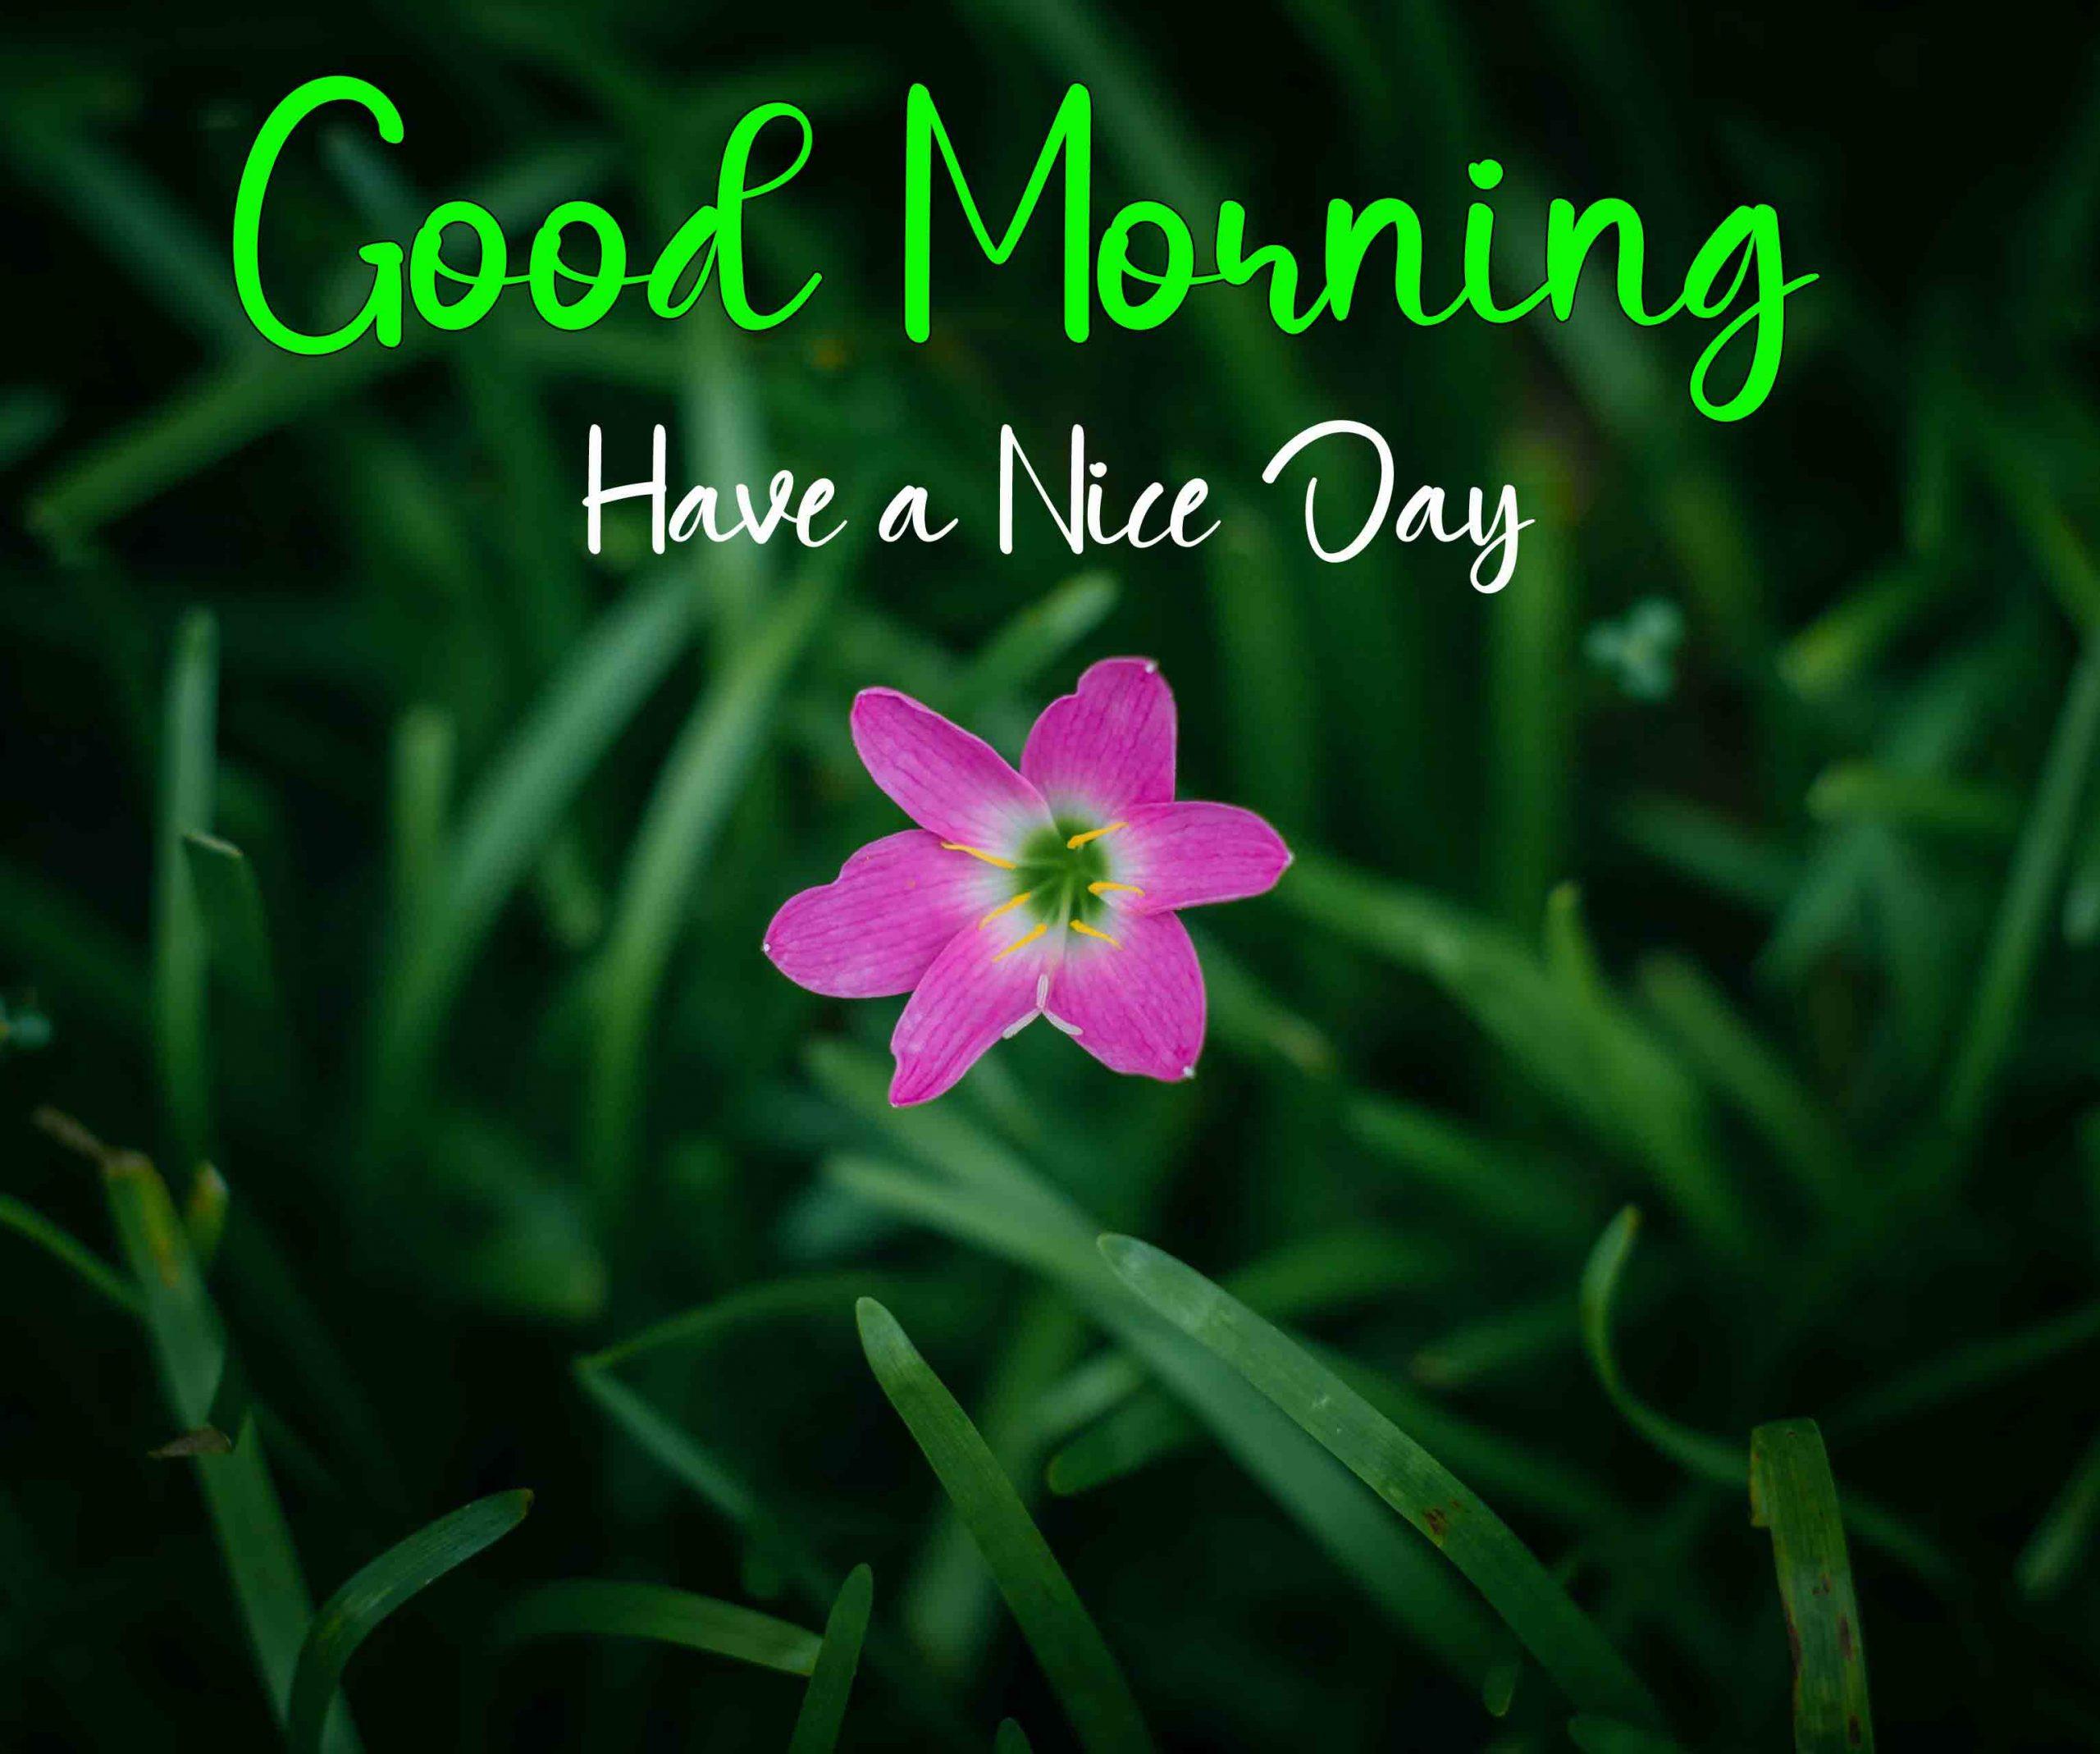 Best Friend HD Good Morning Dear Images